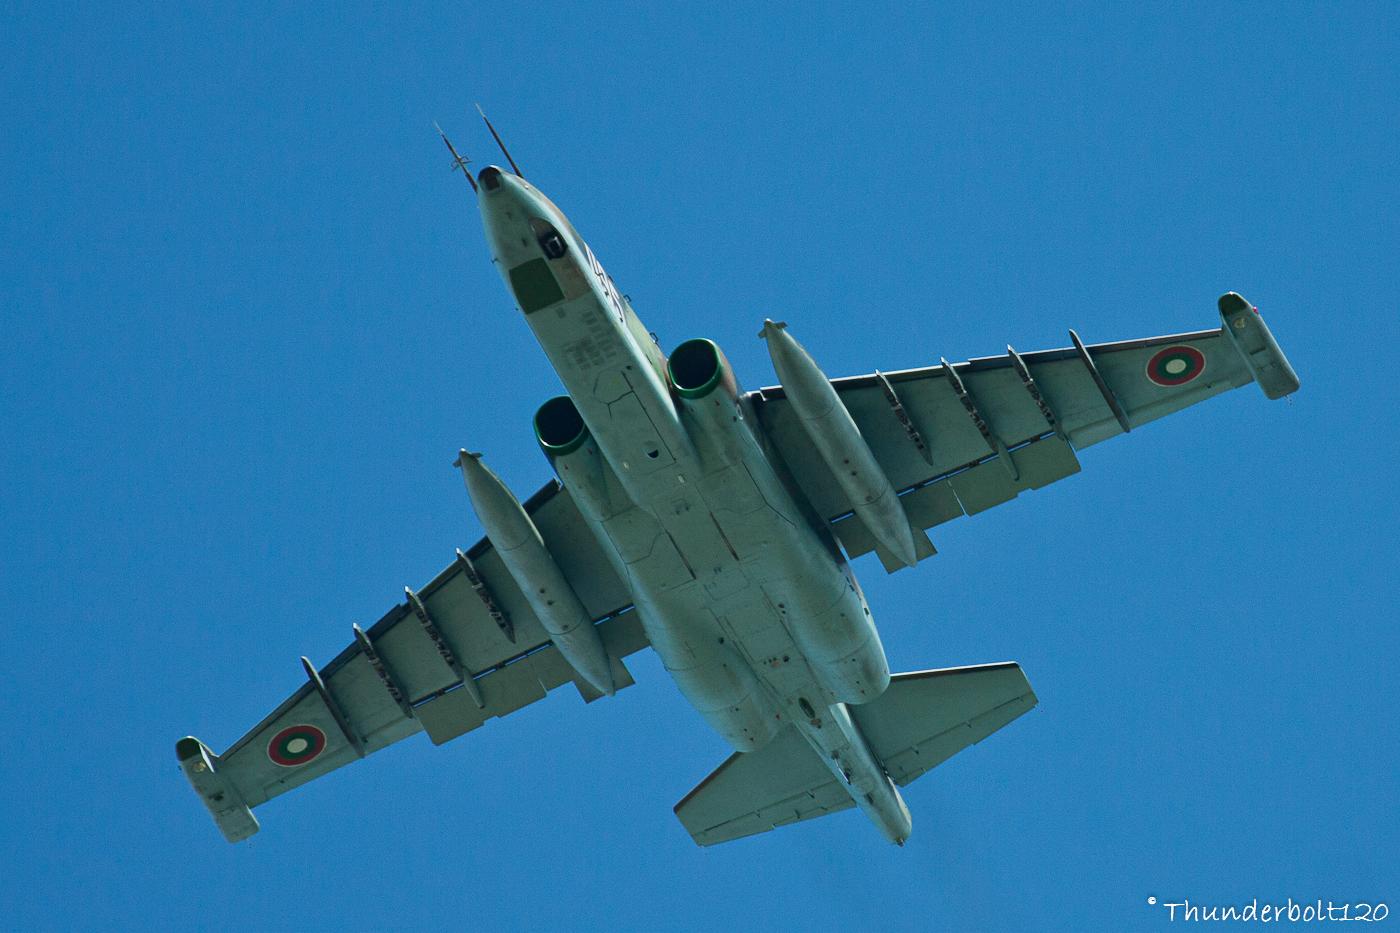 Su-25 UBK Frogfoot 095